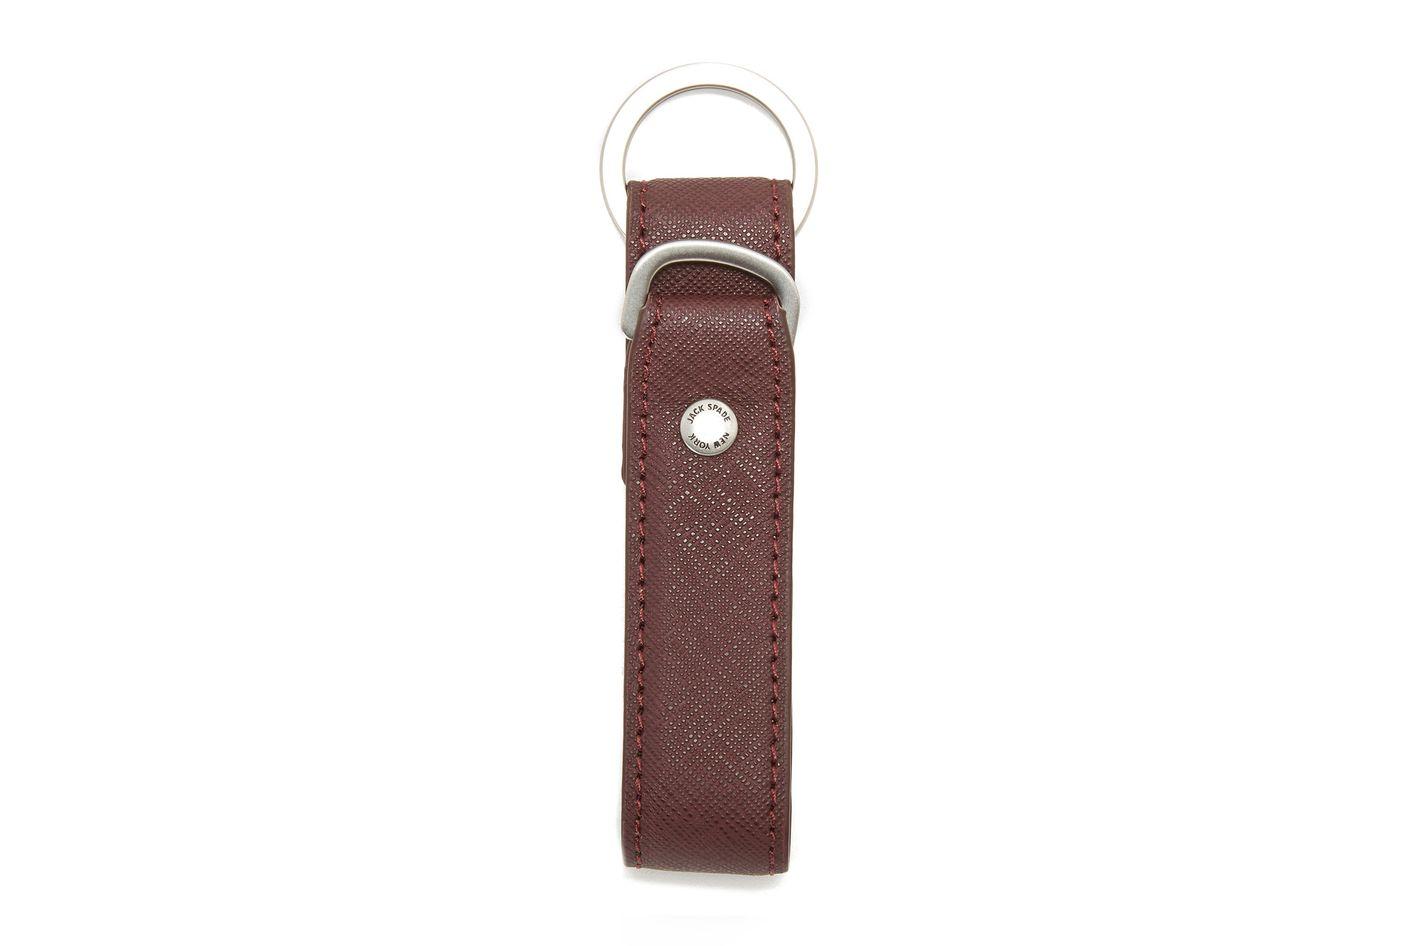 Jack Spade Barrow Leather Keyfob